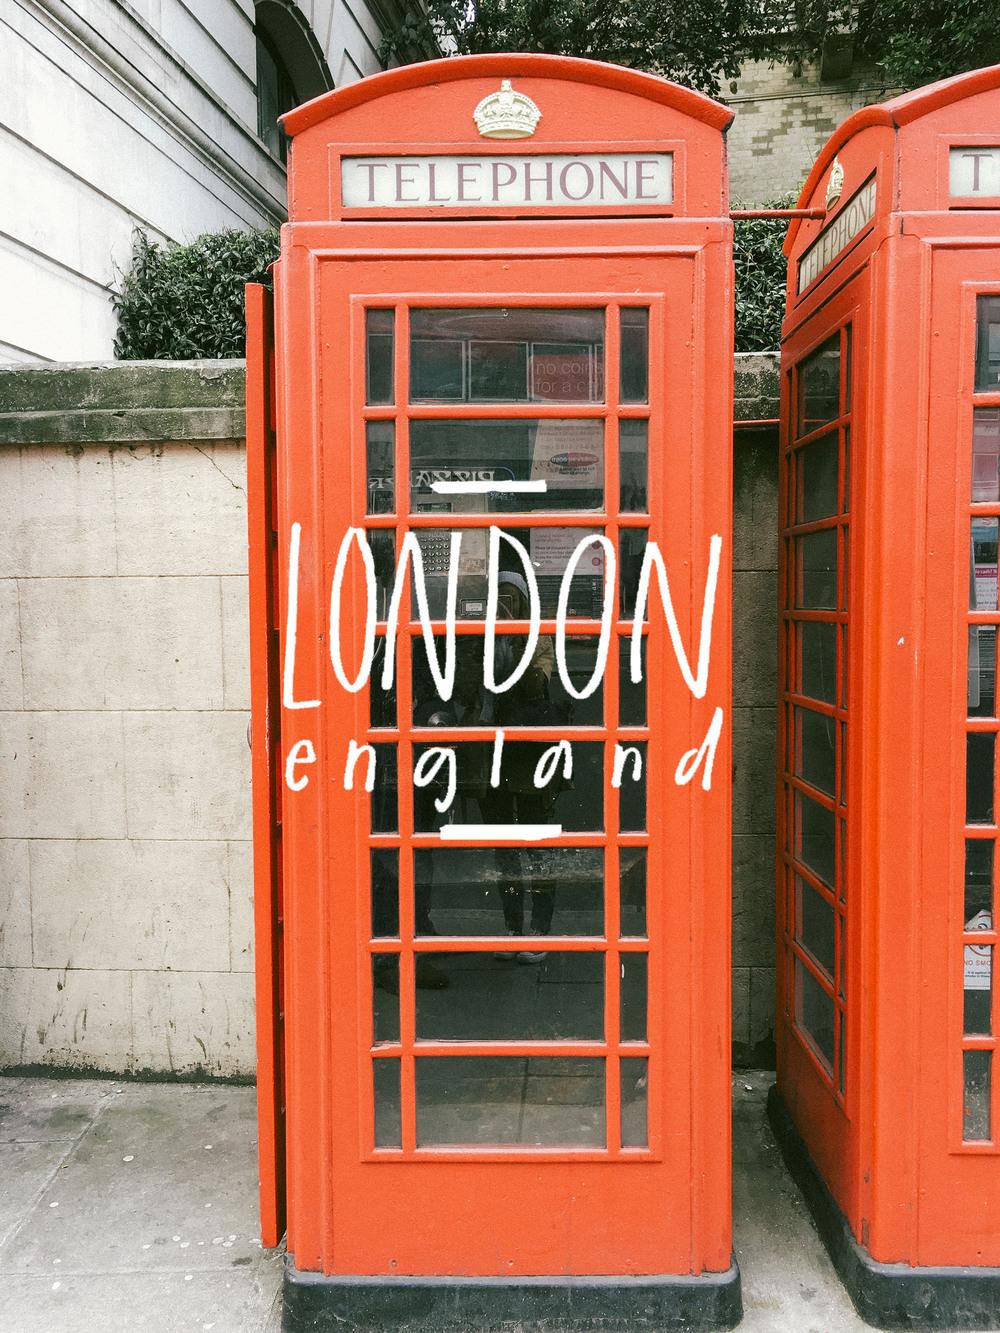 London.phonebooth.jpg